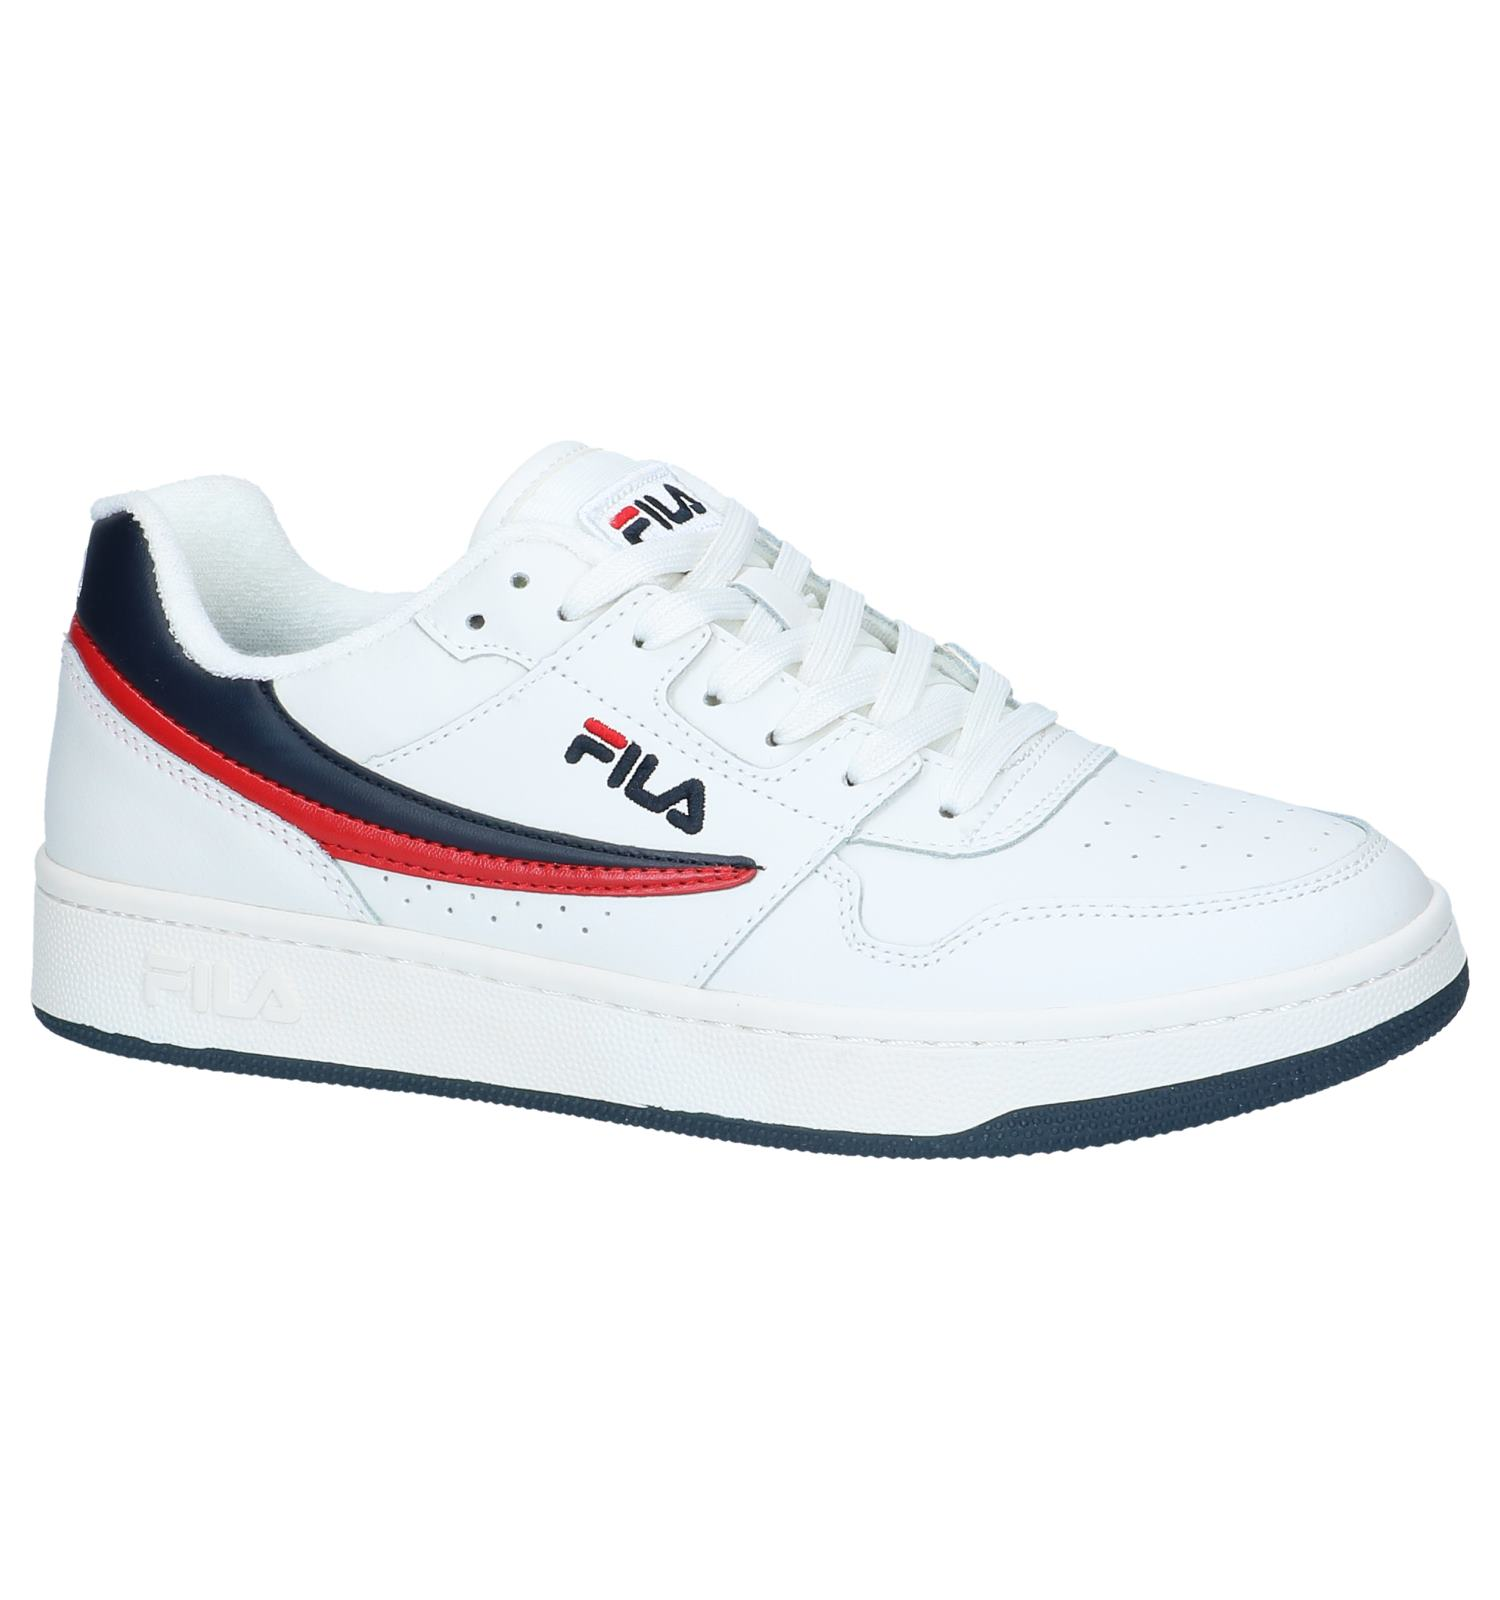 63ac315b153 Witte Lage Sneakers Fila Arcade Low   TORFS.BE   Gratis verzend en retour